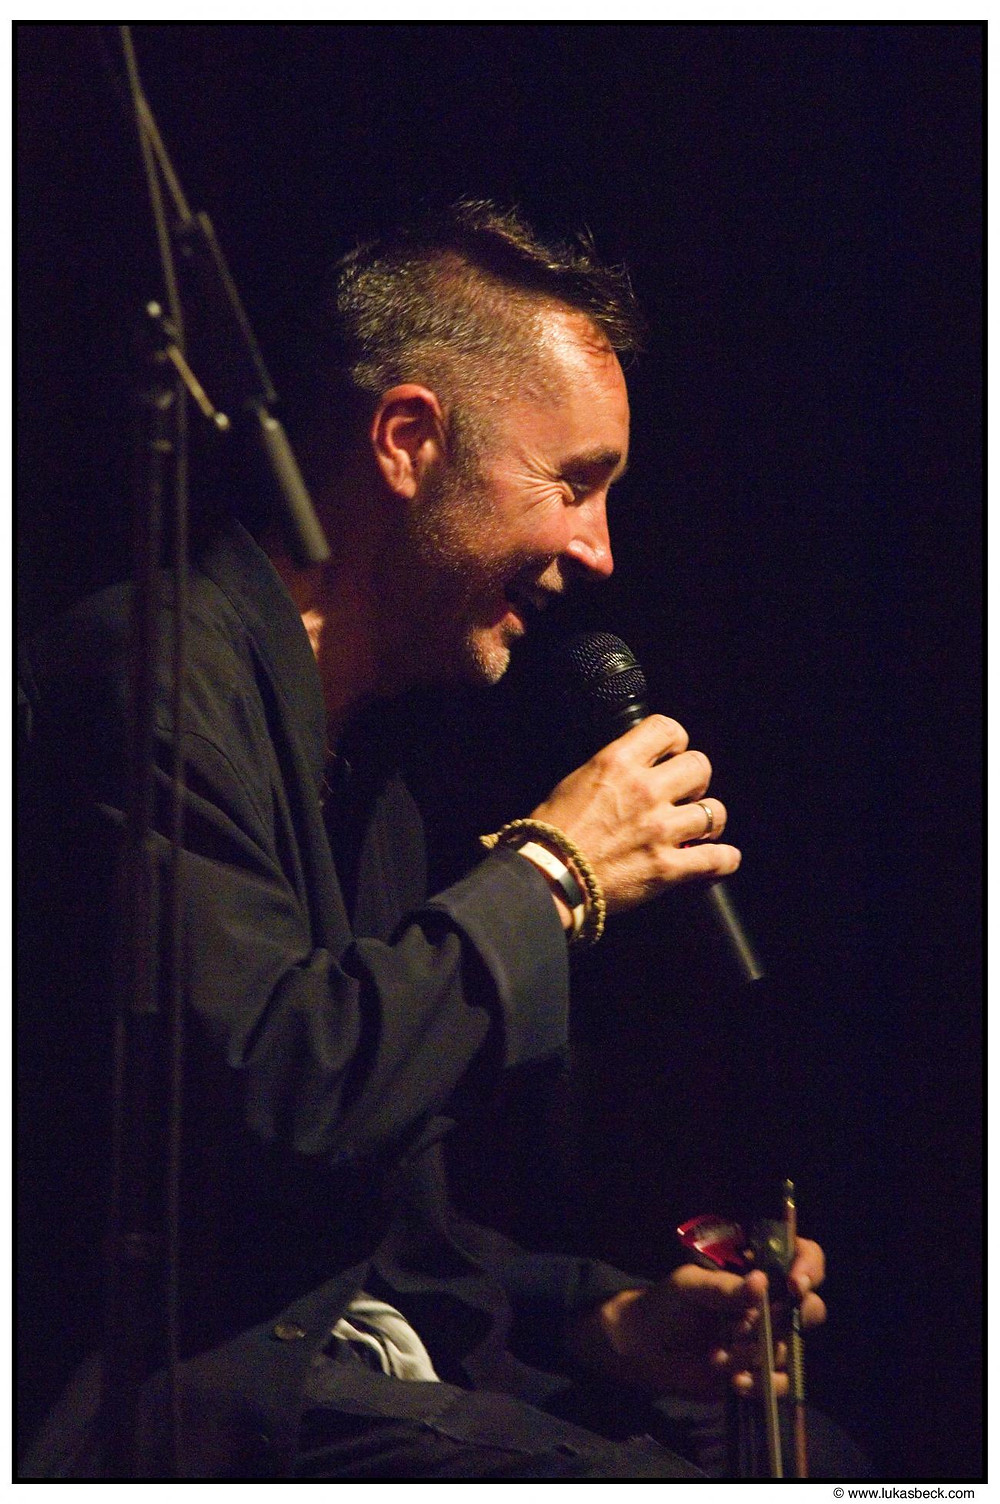 Nigel Kennedy. Photo: Lukas Beck/EMI Classics